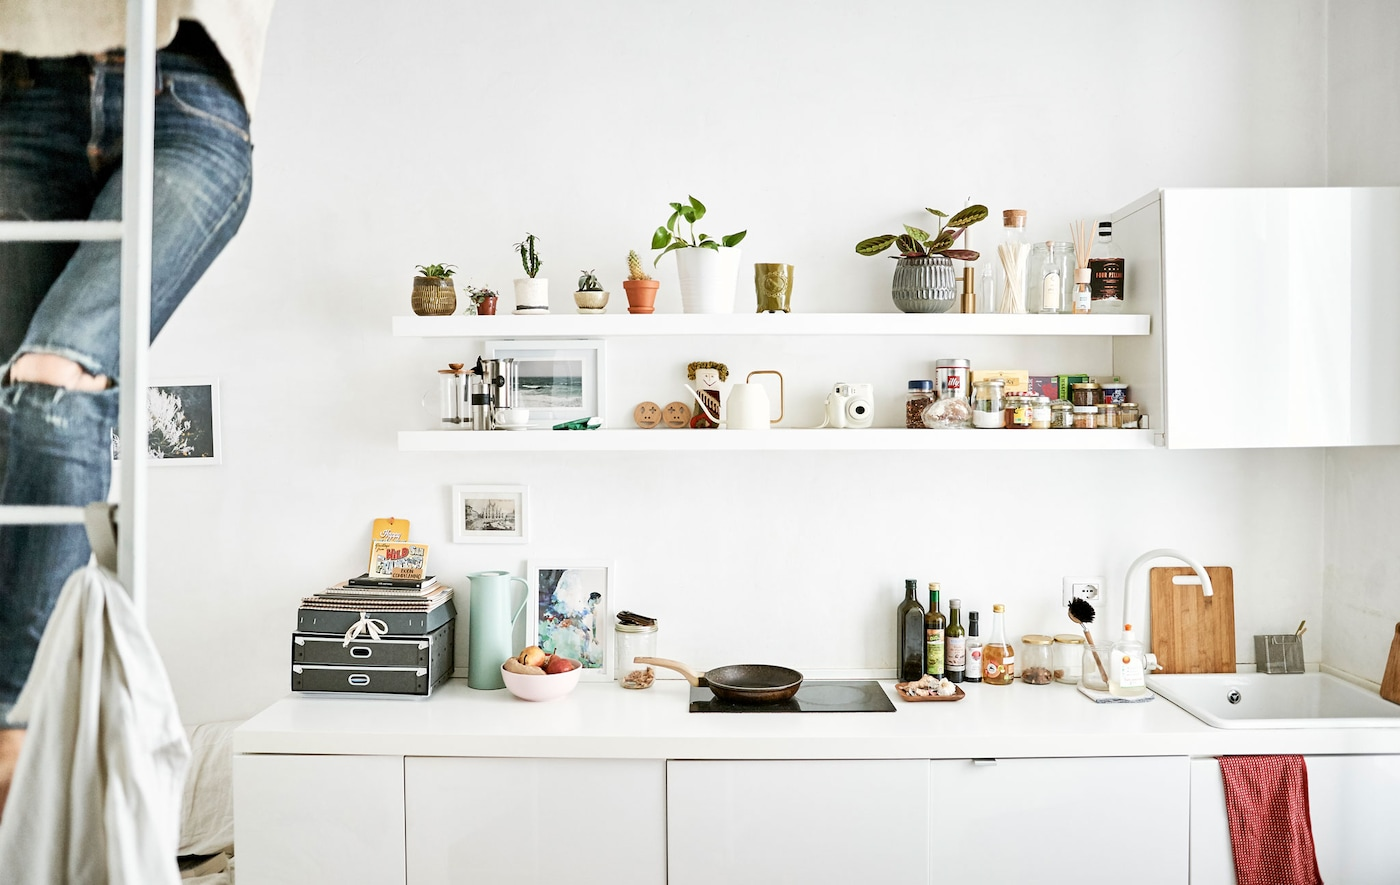 Visita a un hogar: consejos para espacios pequeños - IKEA